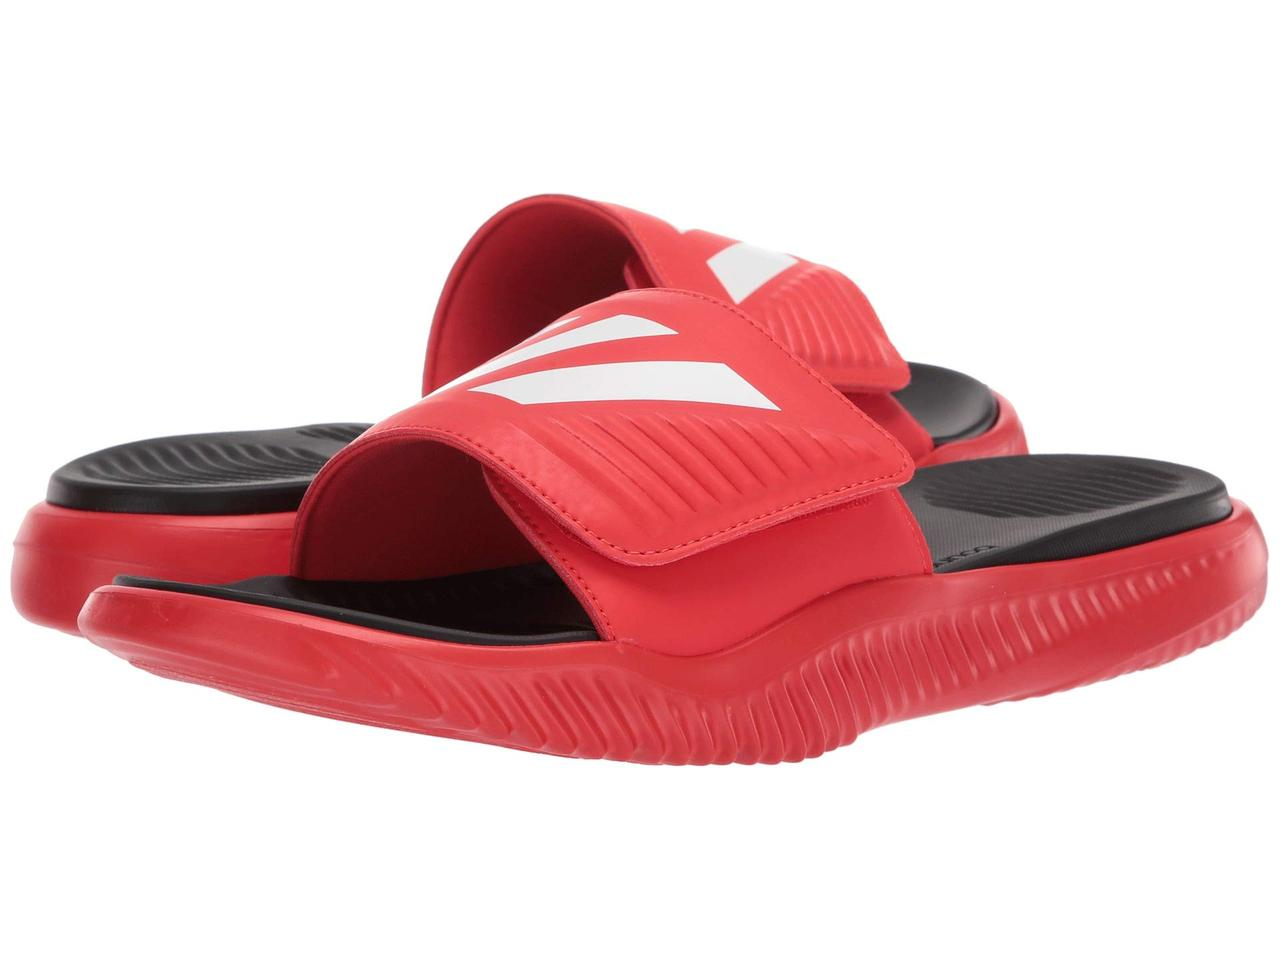 26b7e5ba80f Сандали/Вьетнамки (Оригинал) adidas Alphabounce Basketball Slides Active  Red/Footwear White/Core Black